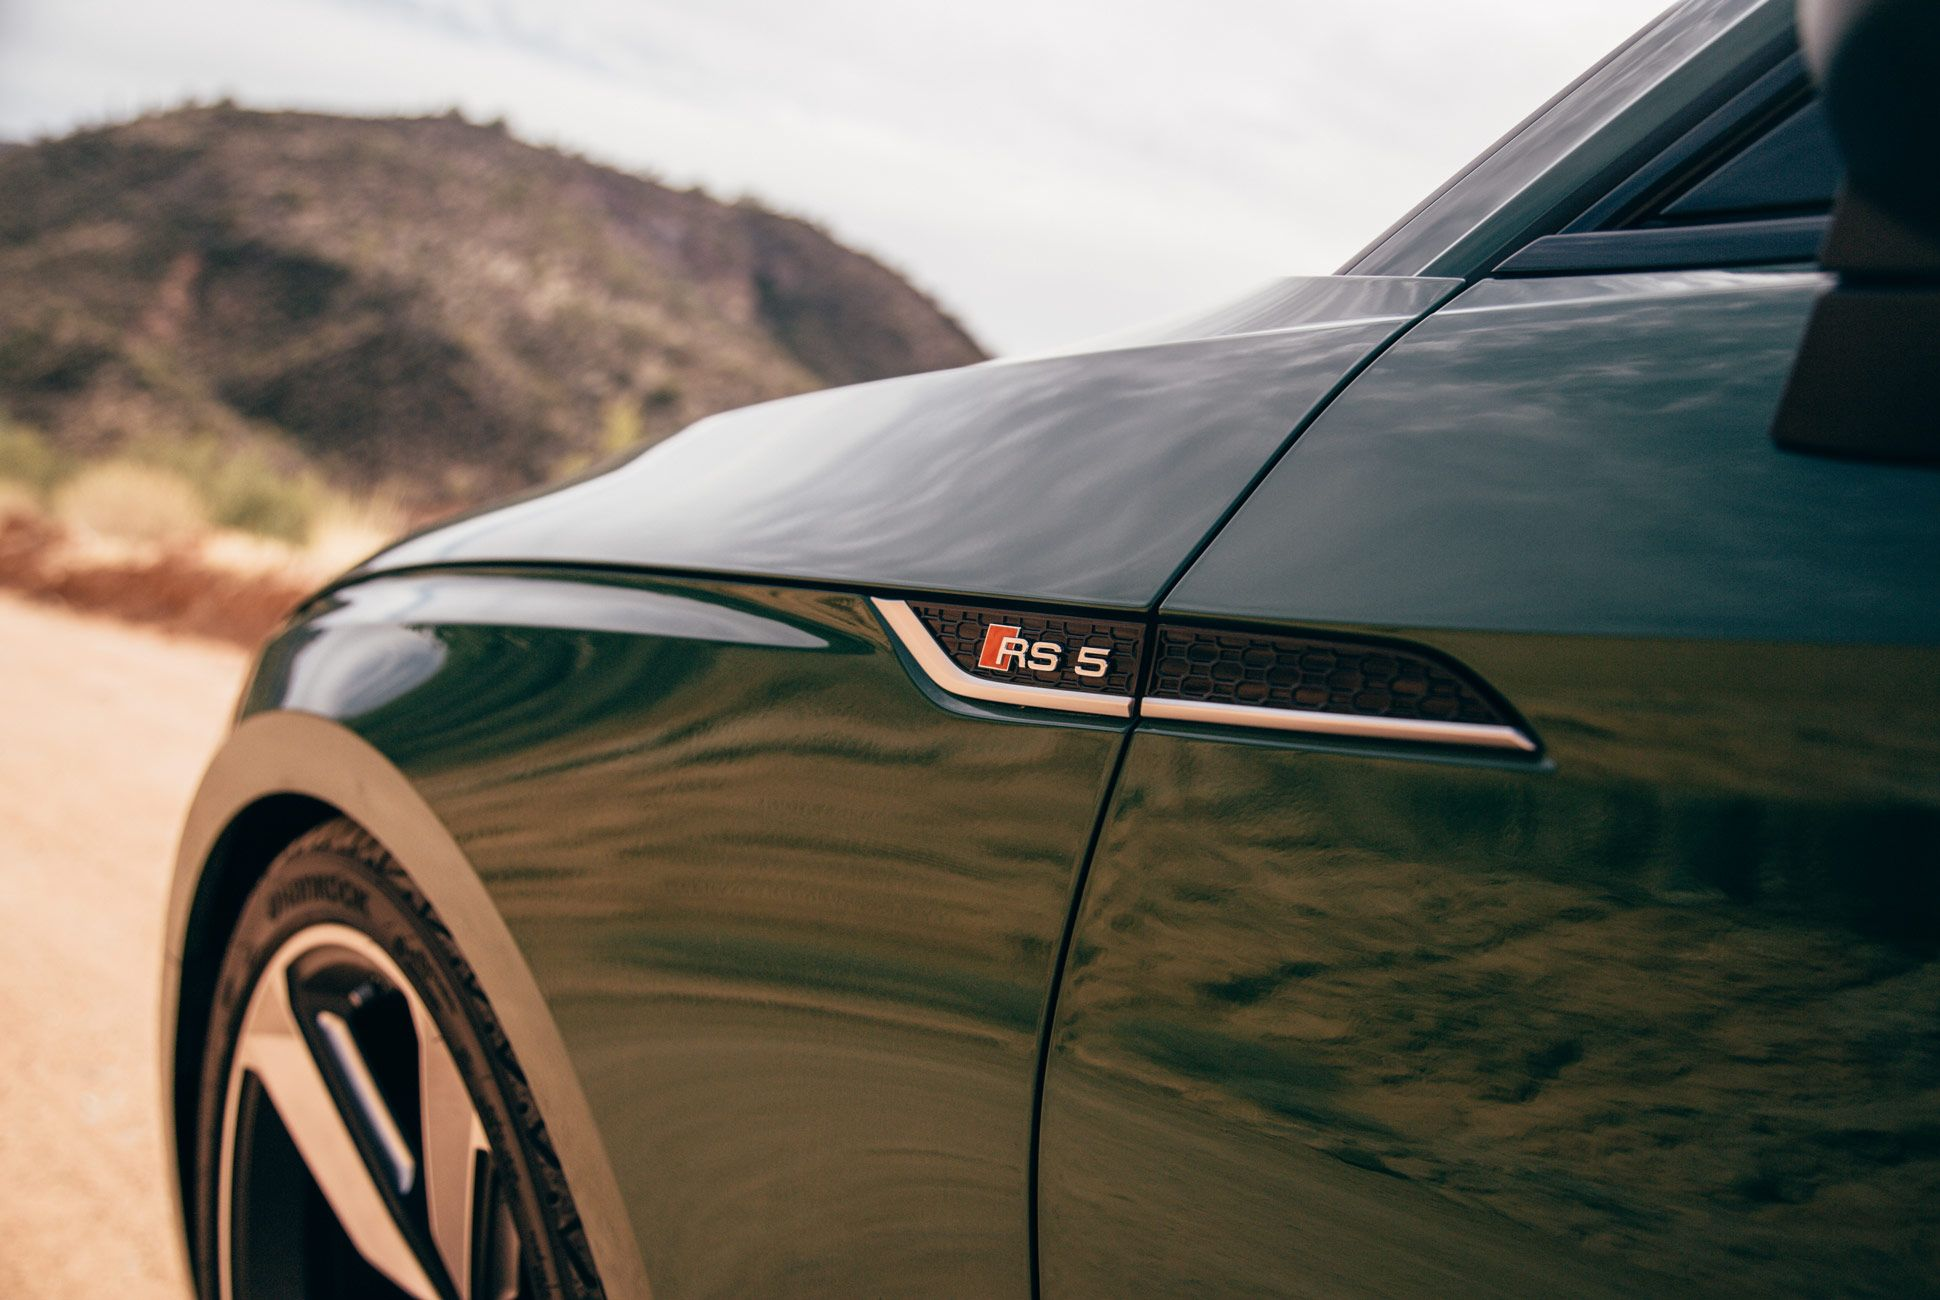 Audi-RS5-Gear-Patrol-Slide-5